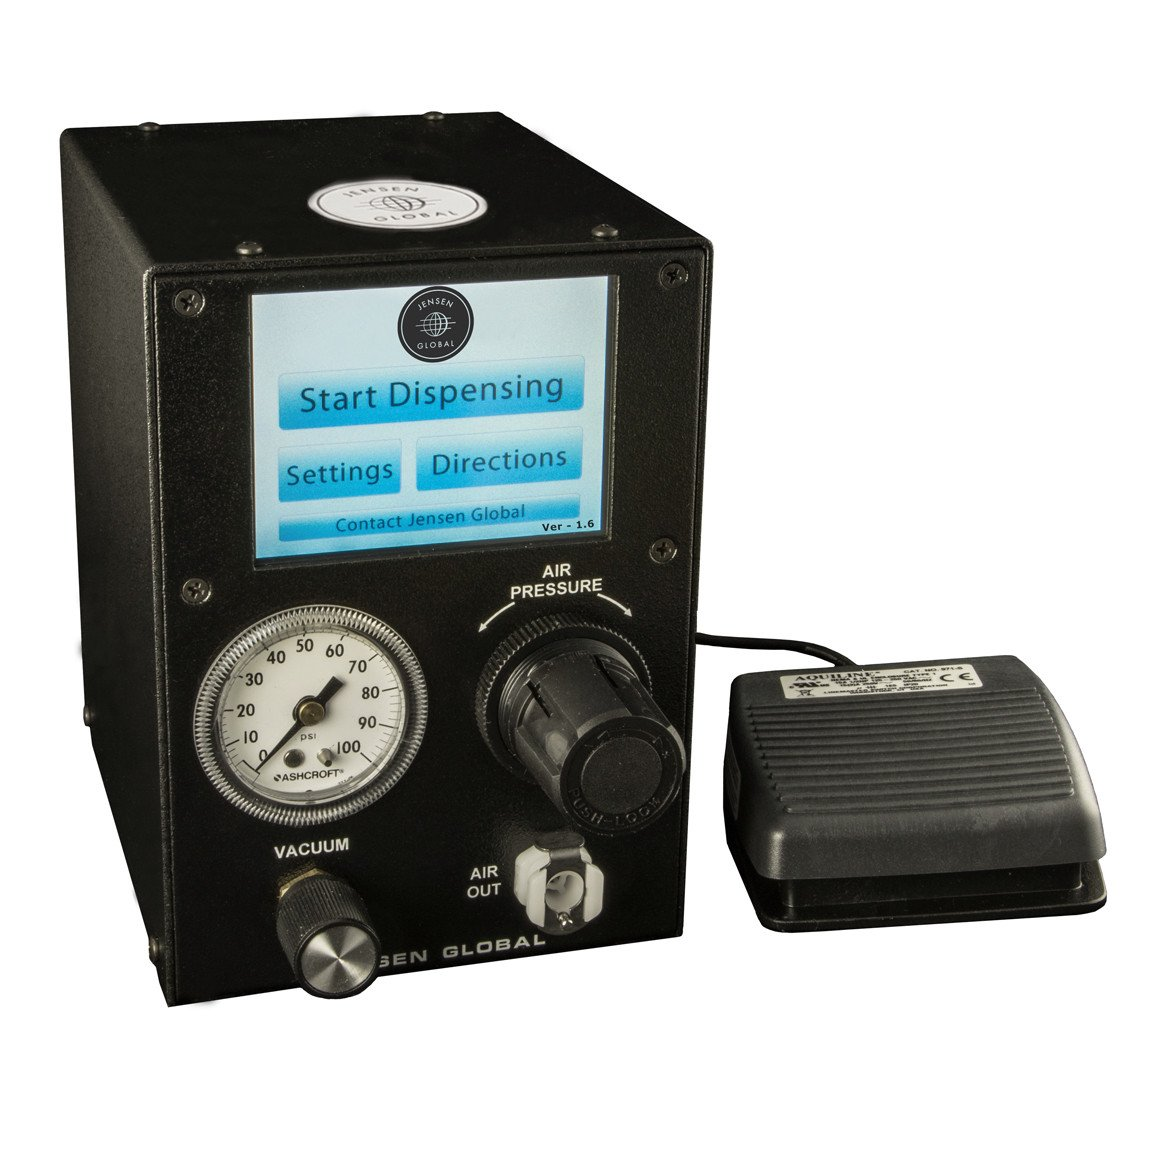 Jensen Global JGD500T 4.0 lb Digital Programmable Shot Meter